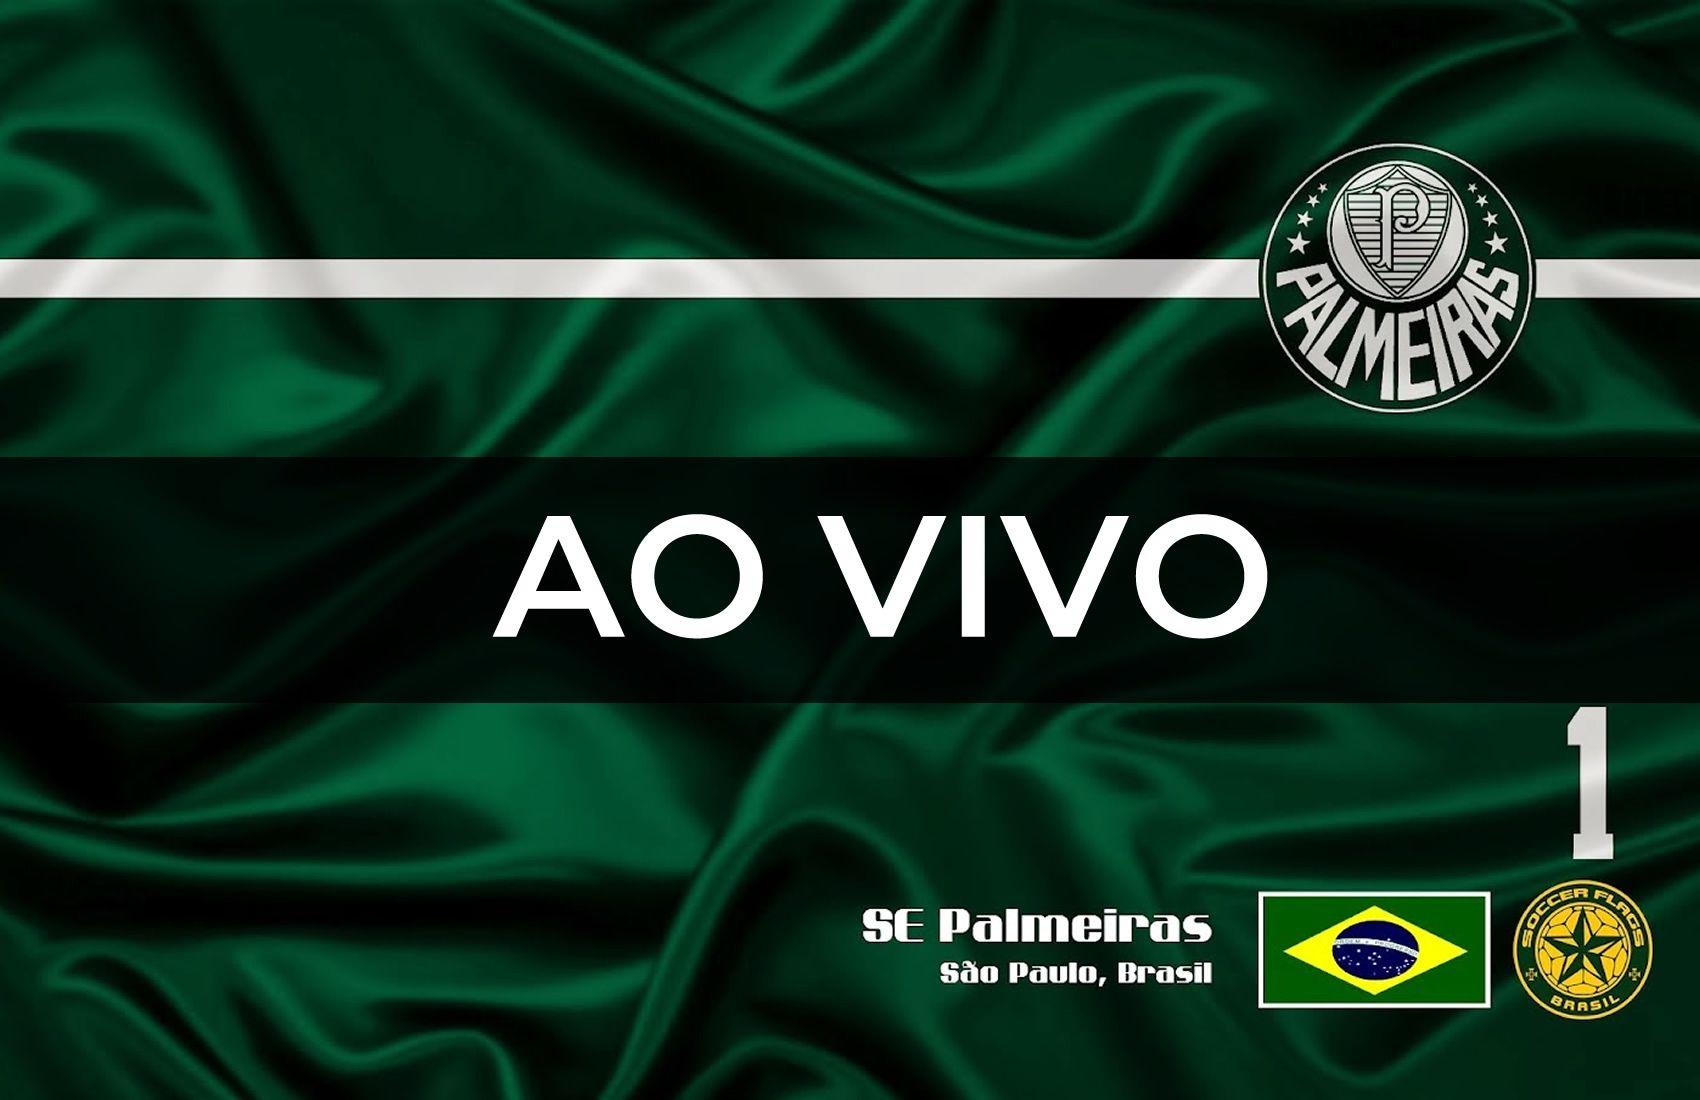 Jogo Do Palmeiras Ao Vivo Jogo Palmeiras Palmeiras Ao